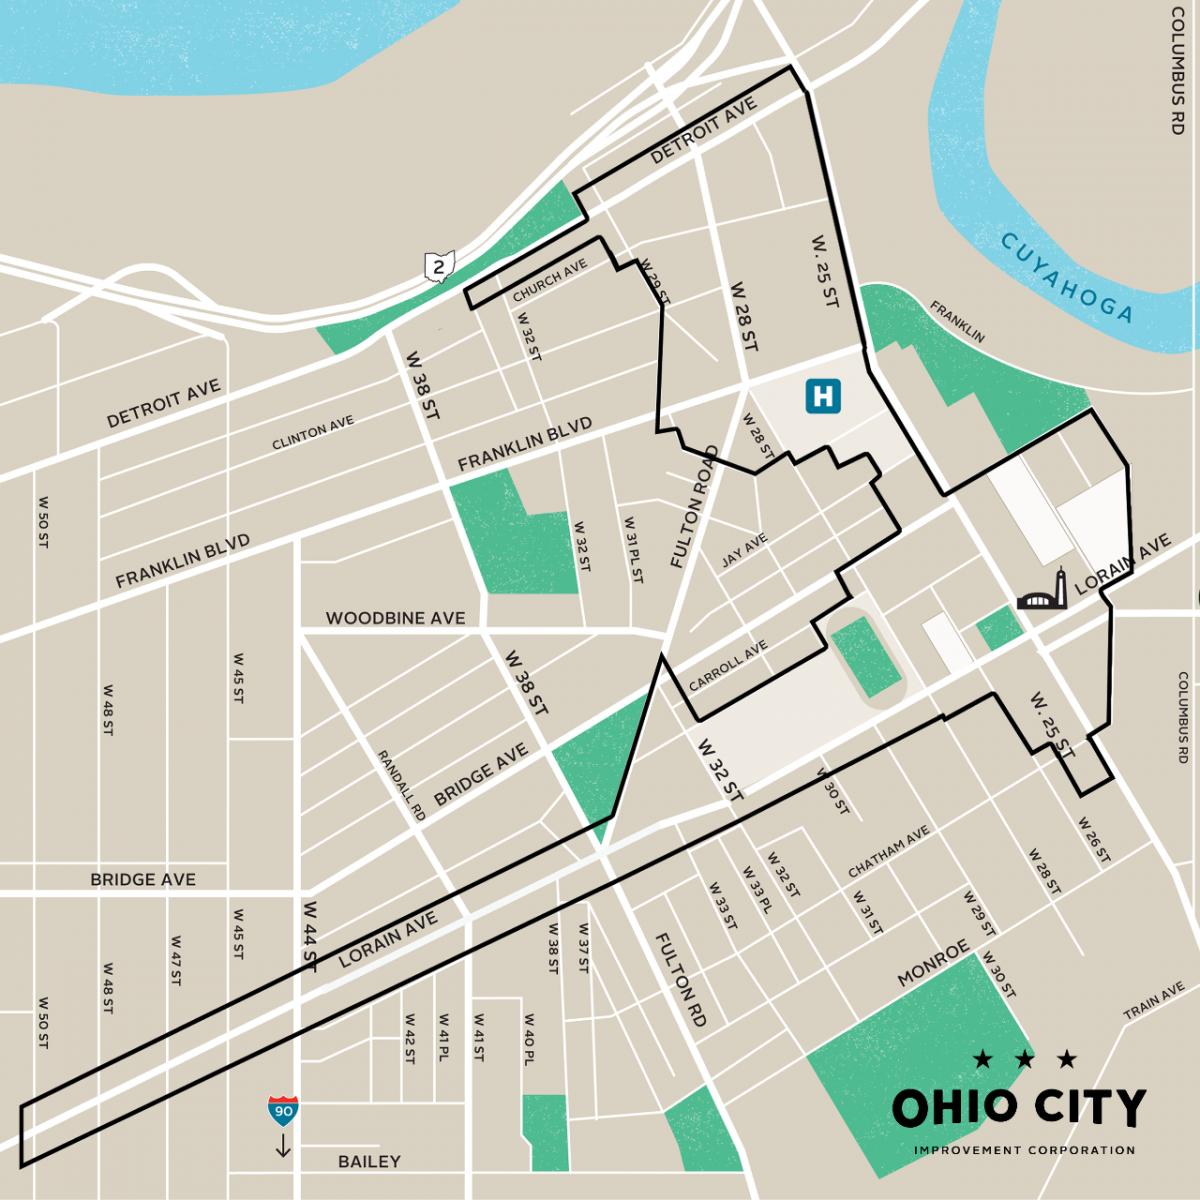 Ohio City Improvement Corporation Boundaries